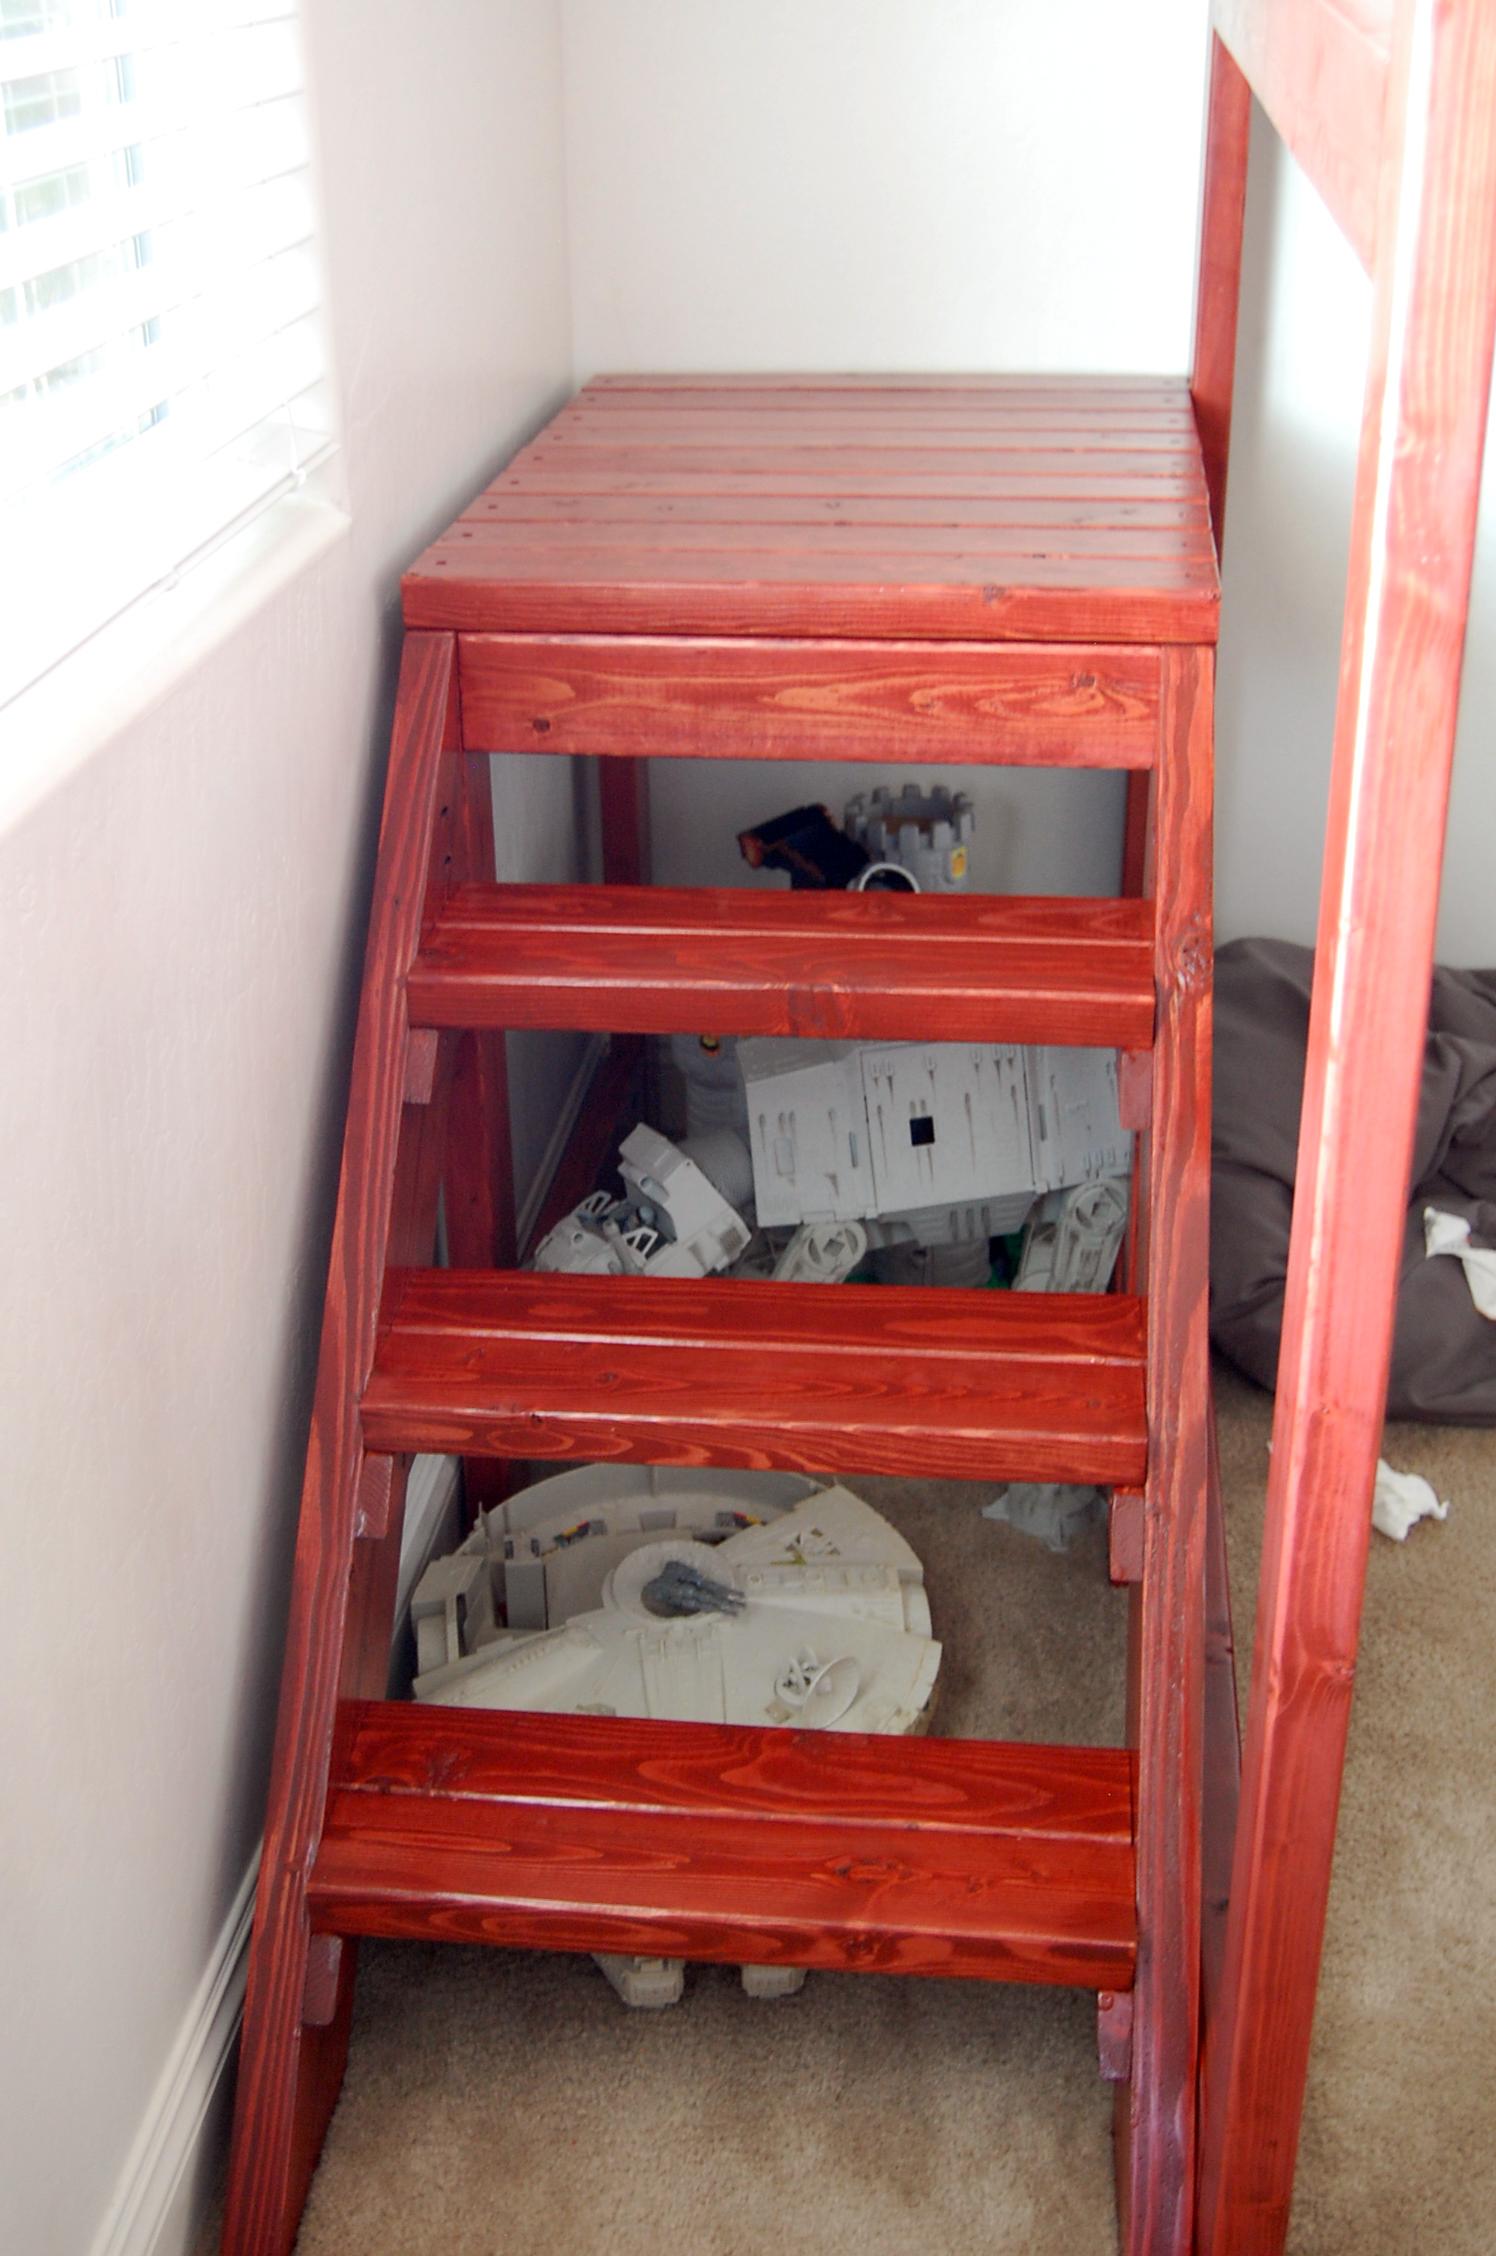 Diy loft bed plans stairs wooden pdf grain storage building diy loft bed plans stairs wooden pdf grain storage building early87irv bedroom sets king solutioingenieria Images